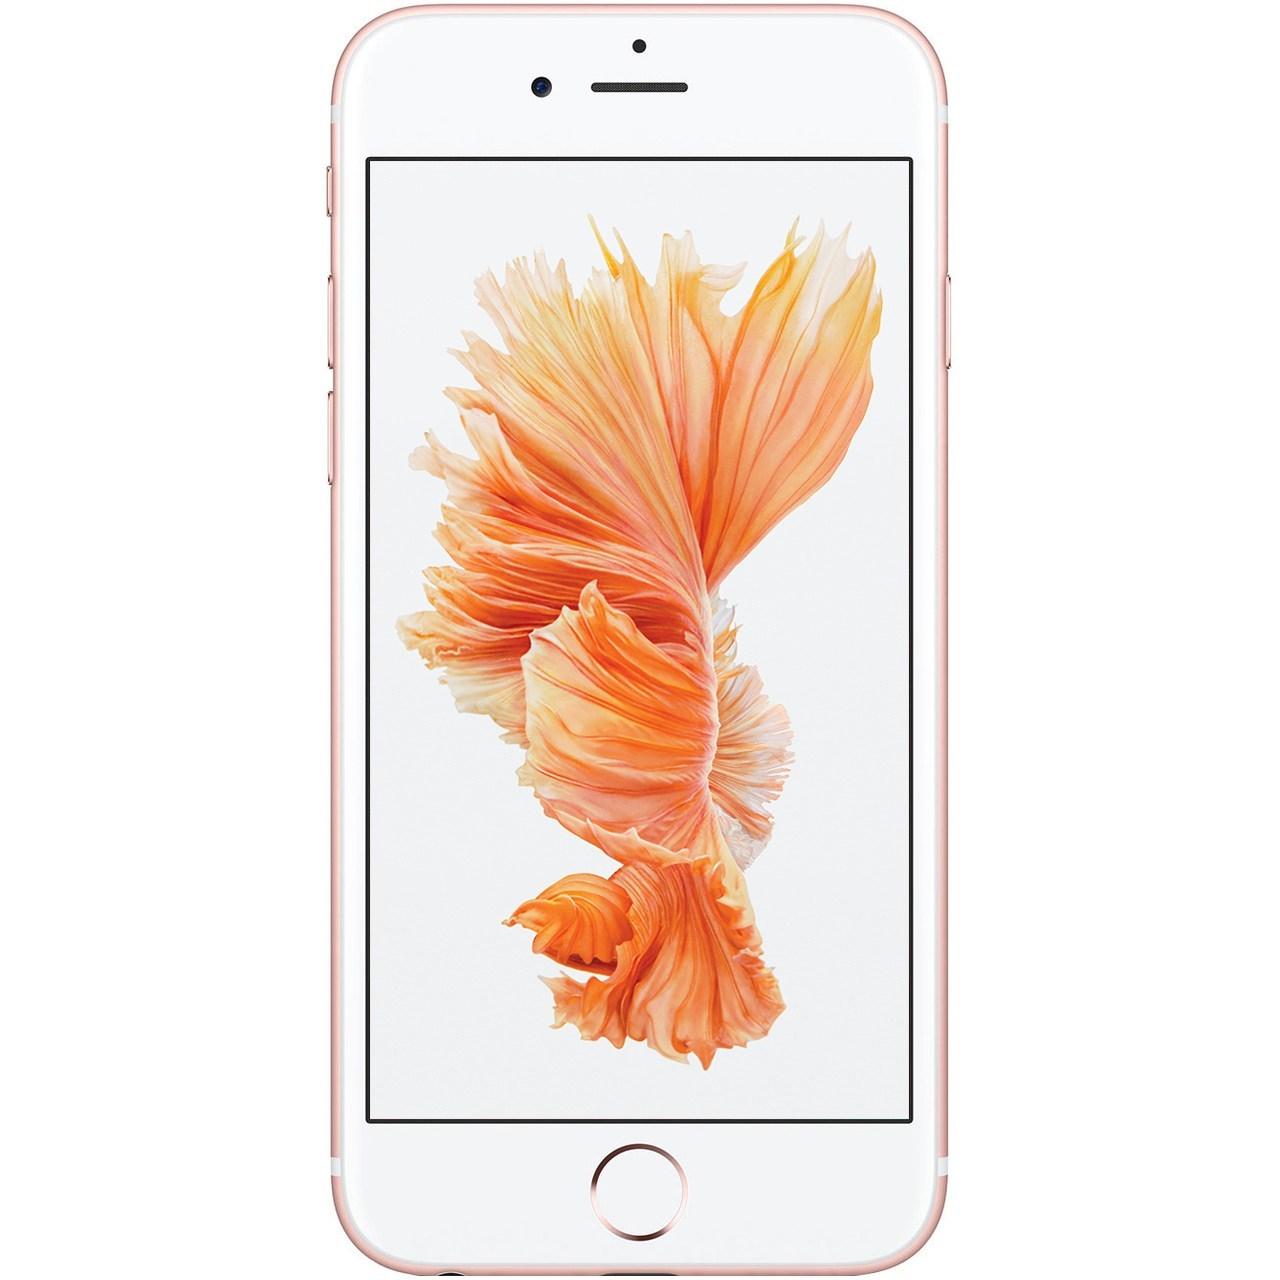 گوشی موبایل اپل مدل iPhone 6s - ظرفیت 16 گیگابایت                             Apple iPhone 6s 16GB Mobile Phone